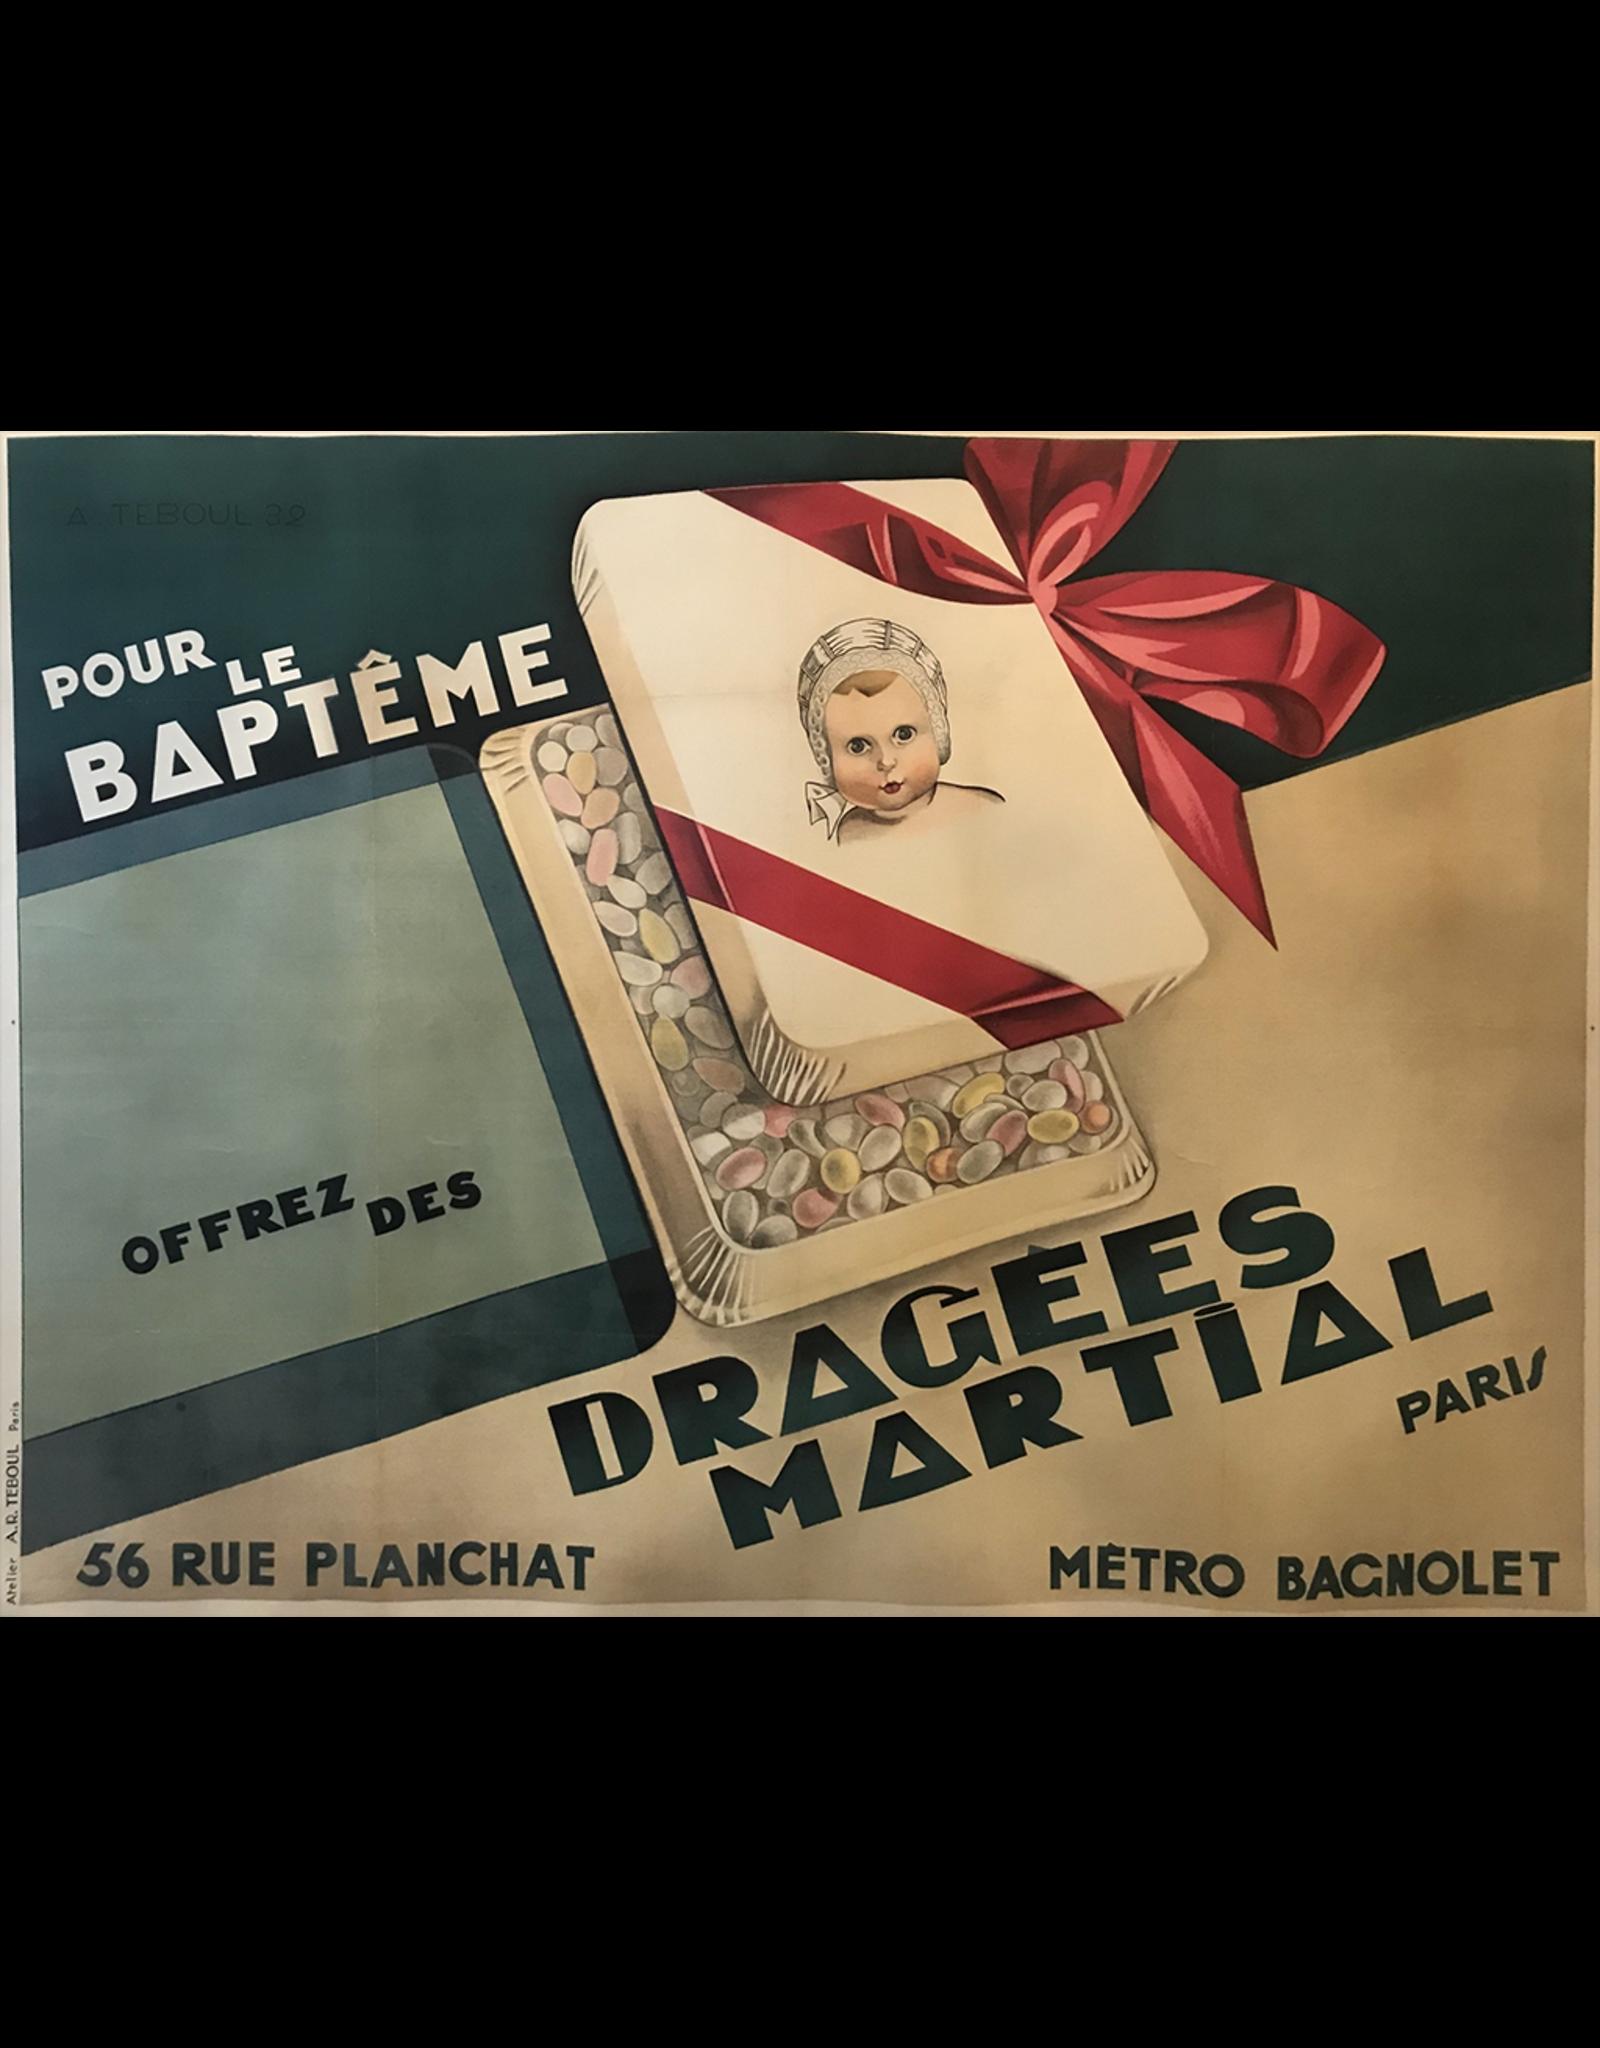 SPV Dragees Martial Paris